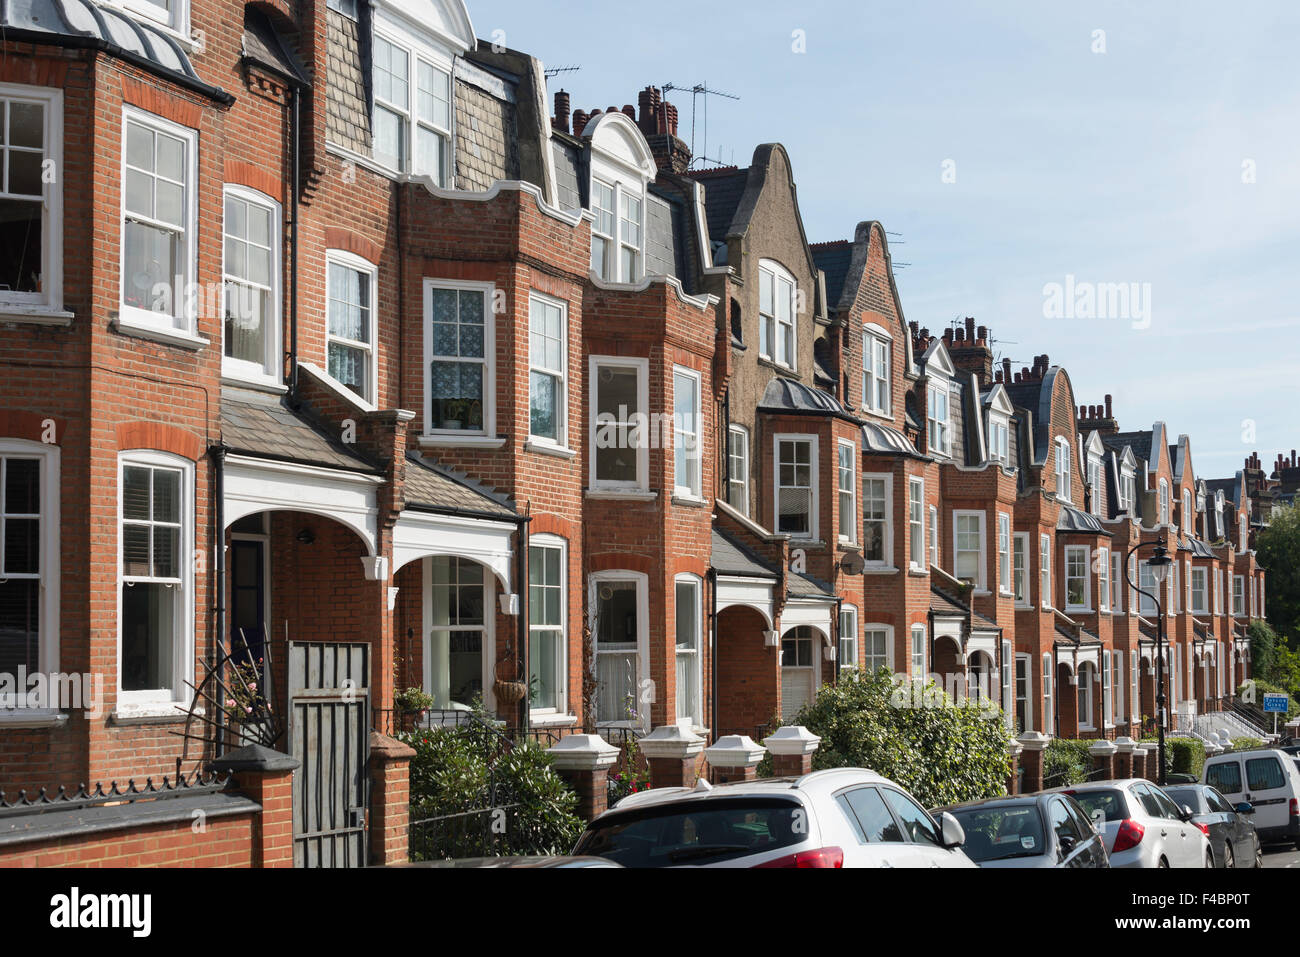 Terraced houses, Hillside Gardens, Highgate, London Borough of Haringey, Greater London, England, United Kingdom - Stock Image